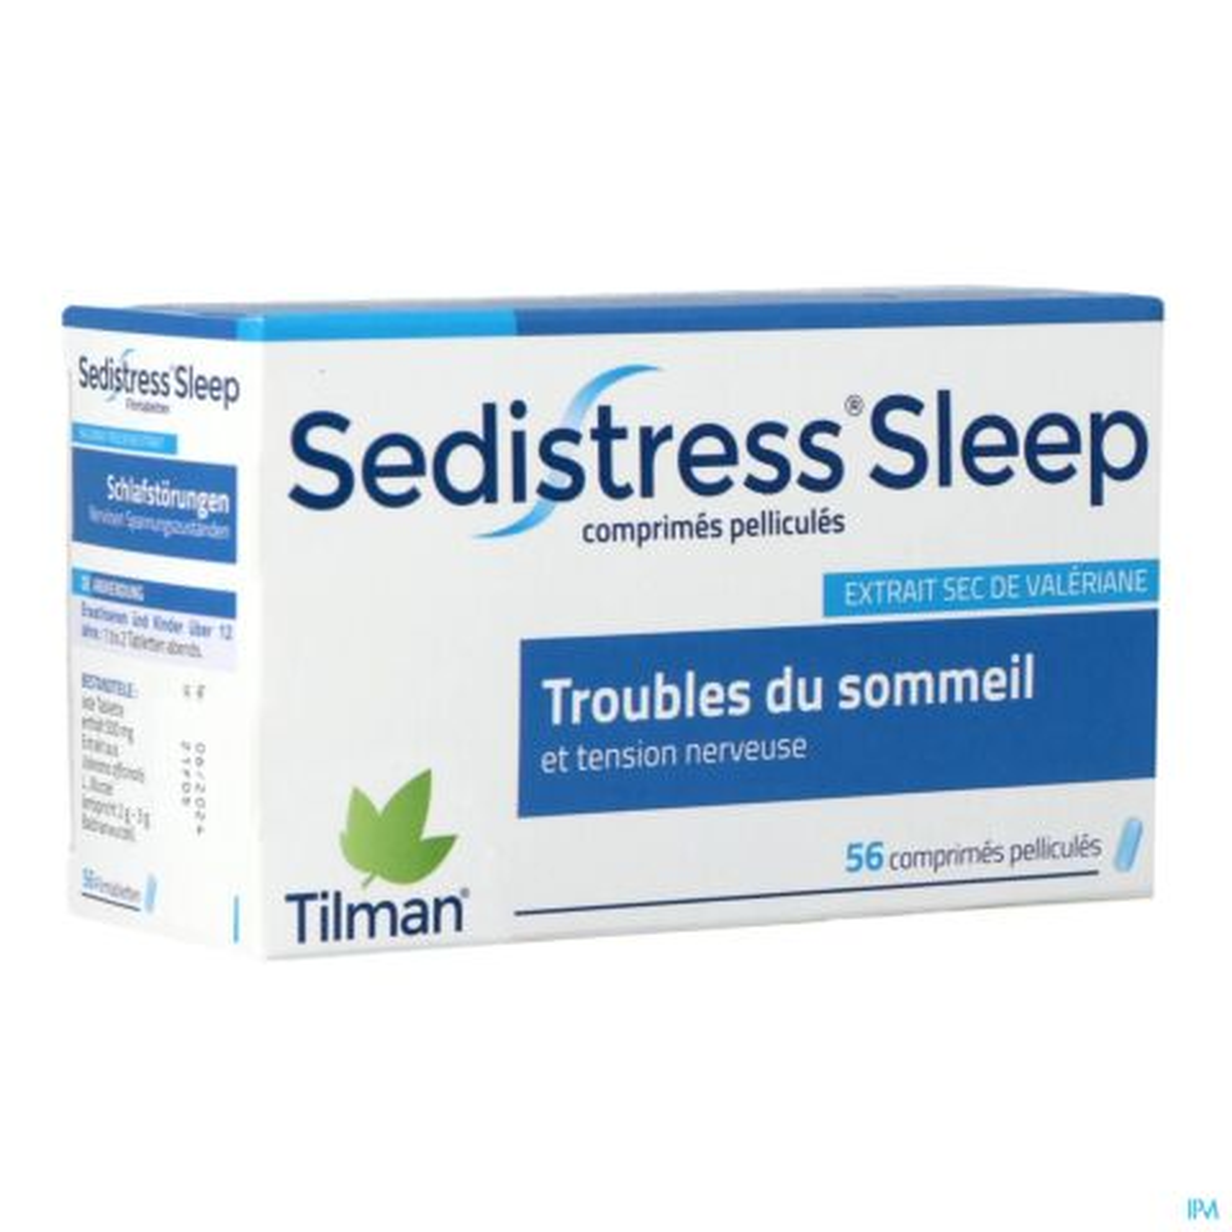 Sedistress Sleep 500mg Troubles du Sommeil Tension Nerveuse 56 Comprimés Pelliculés